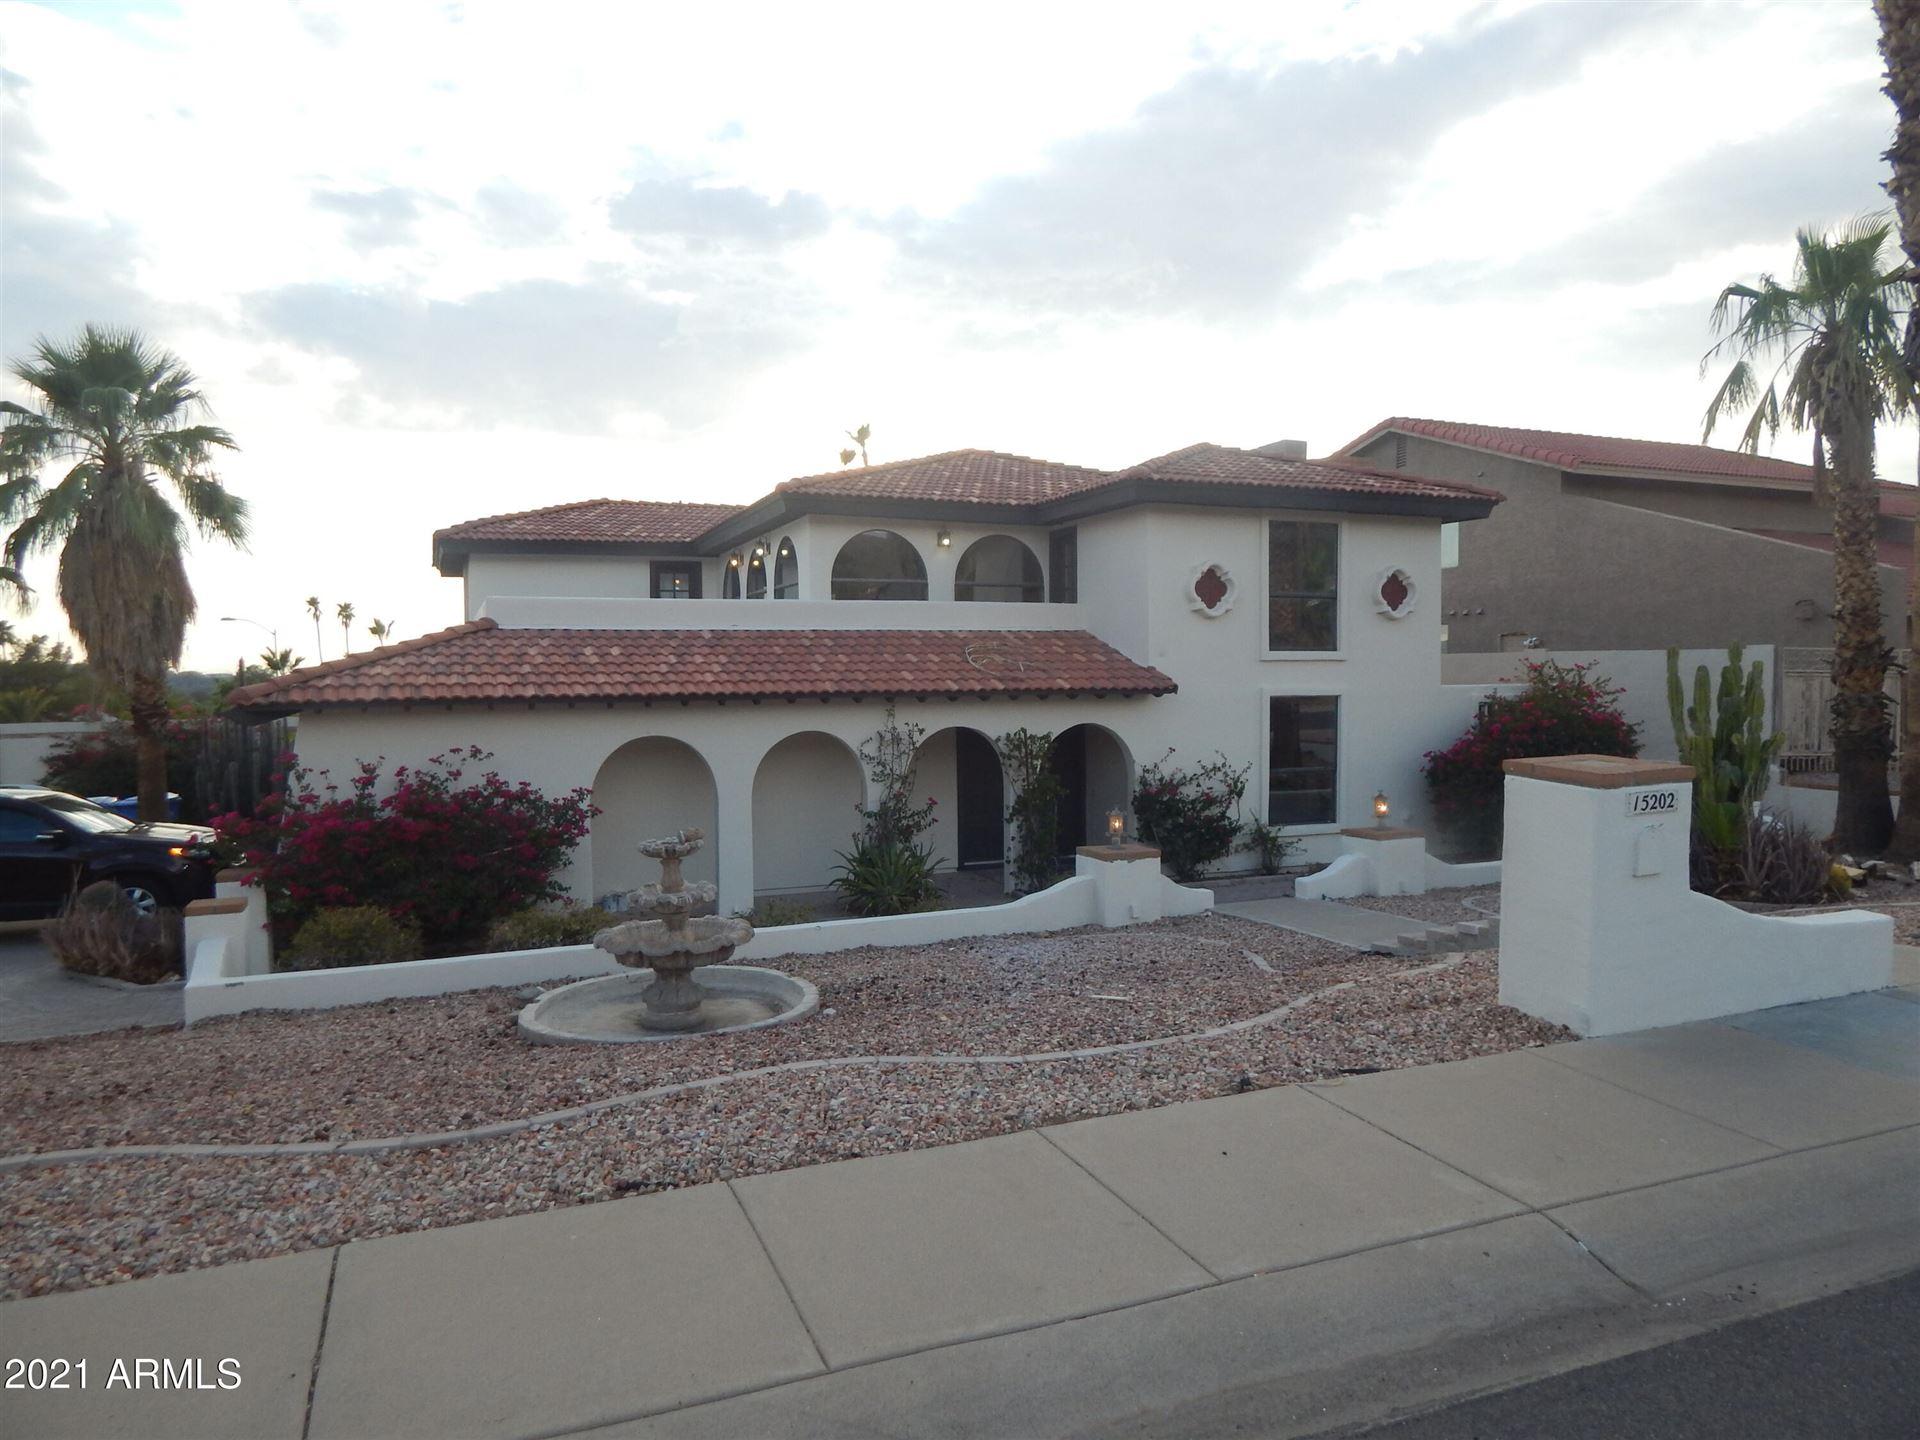 15202 N 10TH Street, Phoenix, AZ 85022 - MLS#: 6263090